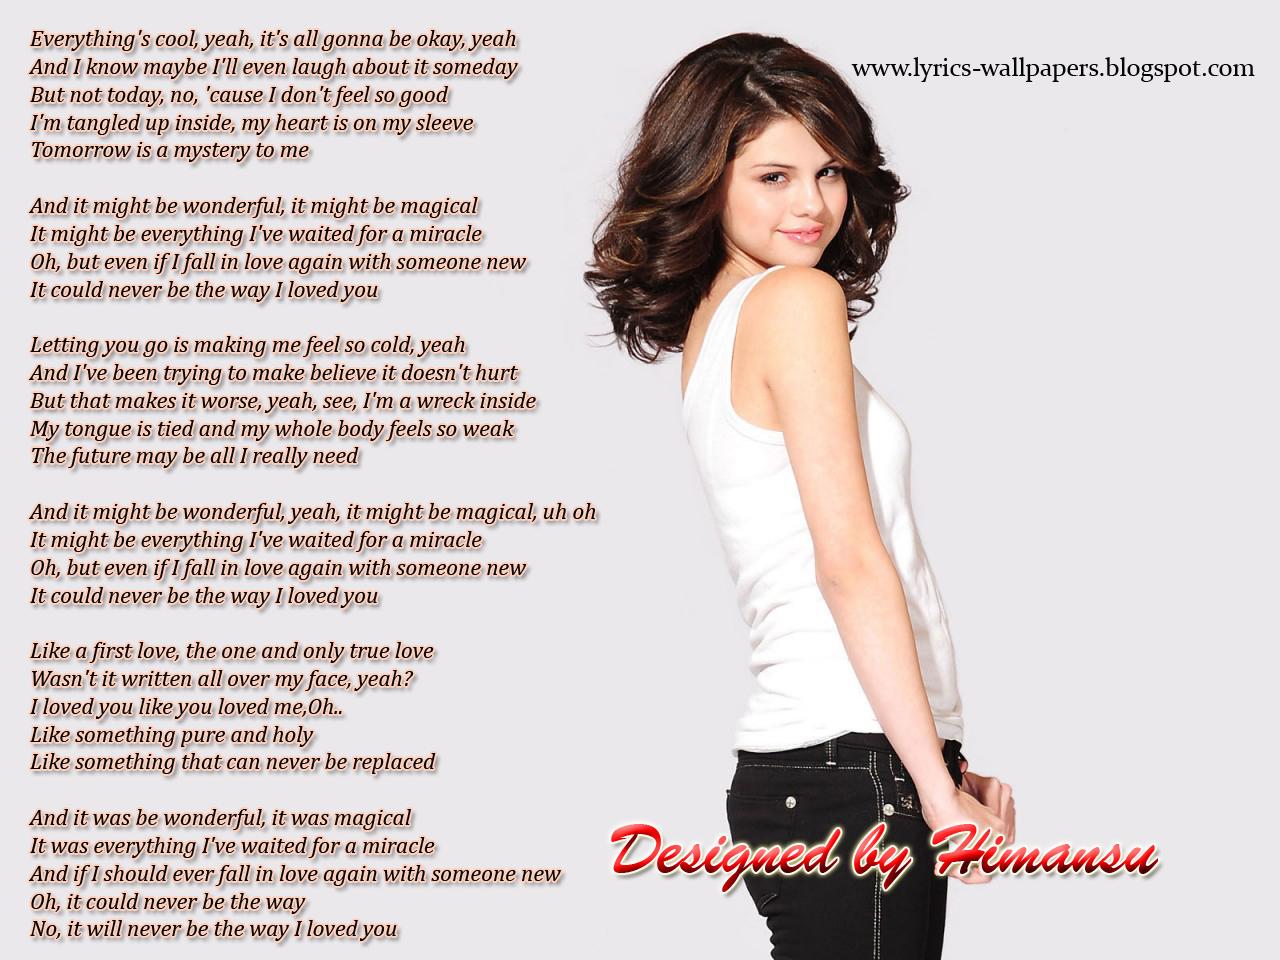 Lyrics Wallpapers: Selena Gomez - The Way I Loved You